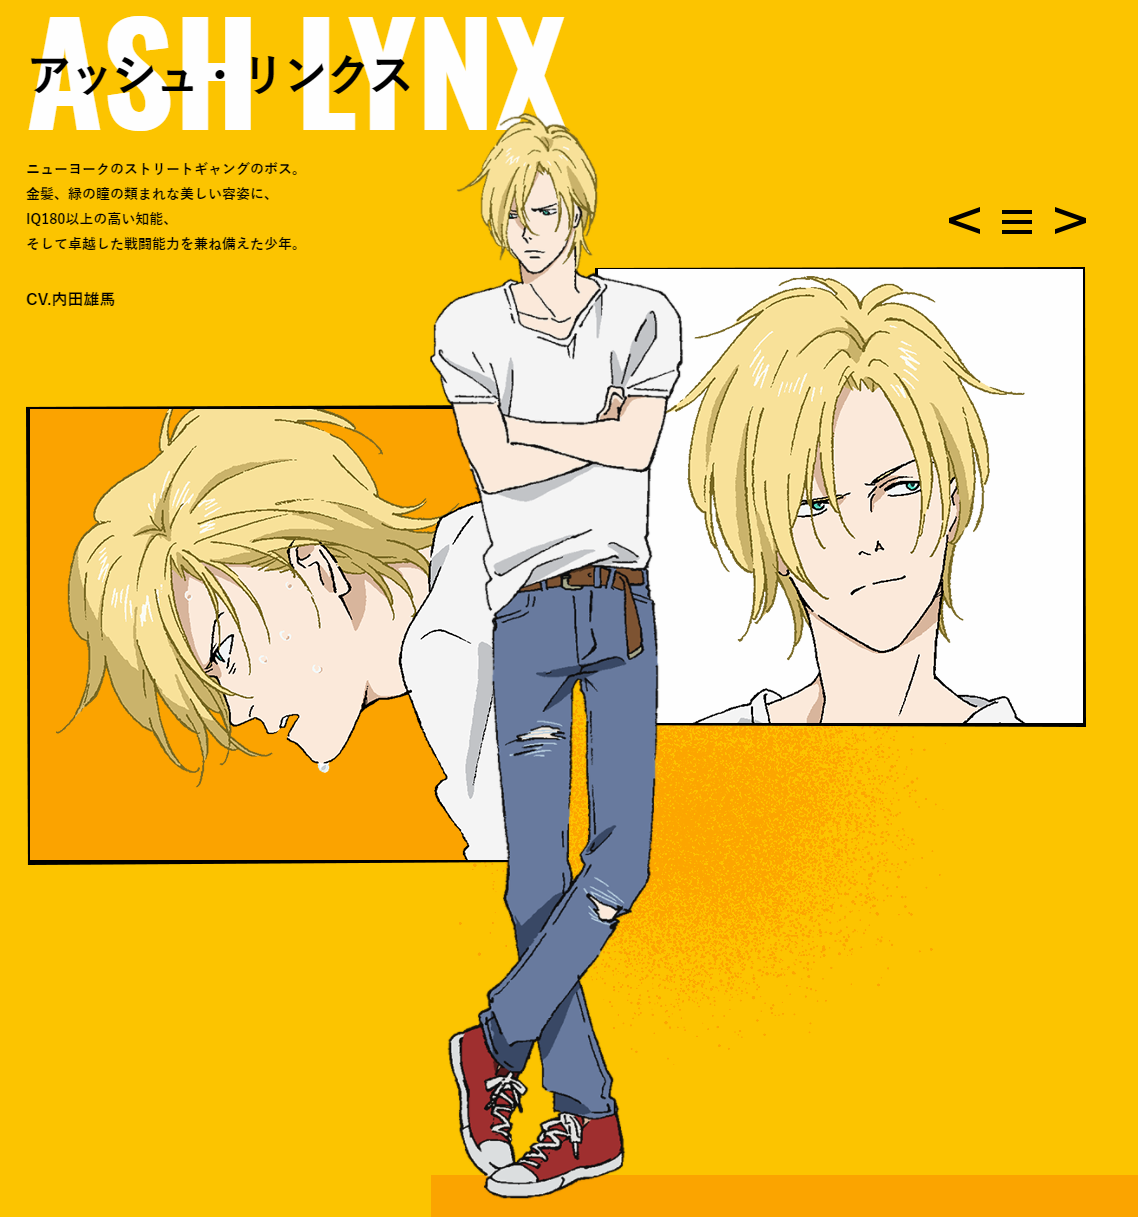 bananafish lynx anime ばななふぃっしゅ